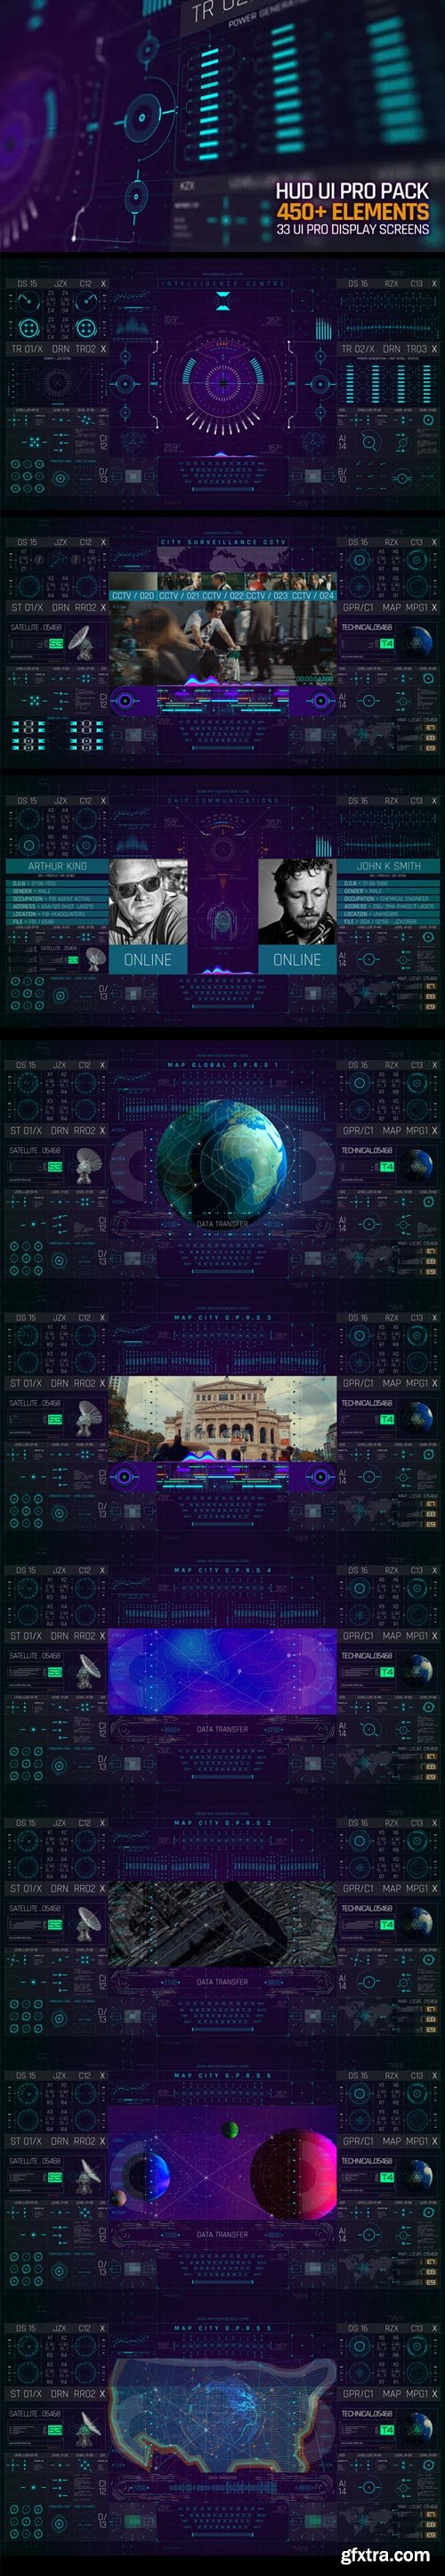 Videohive - HUD UI Pro Pack - 23822700